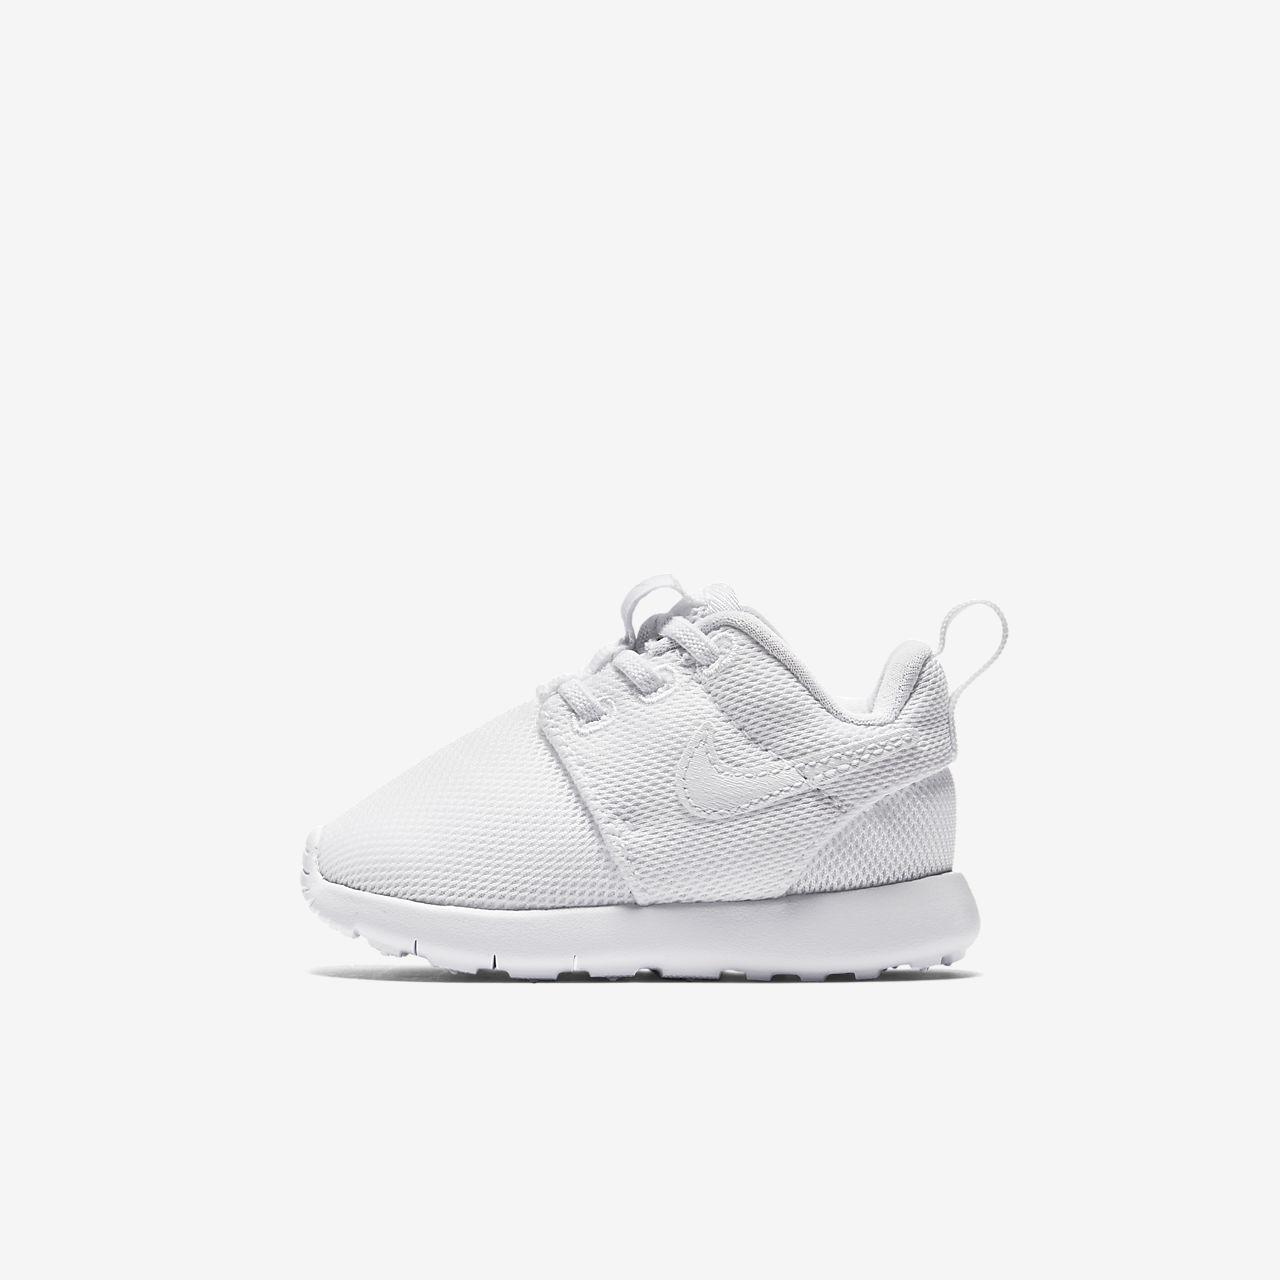 ... Nike Roshe One (1.5-9.5) Baby & Toddler Kids' Shoe